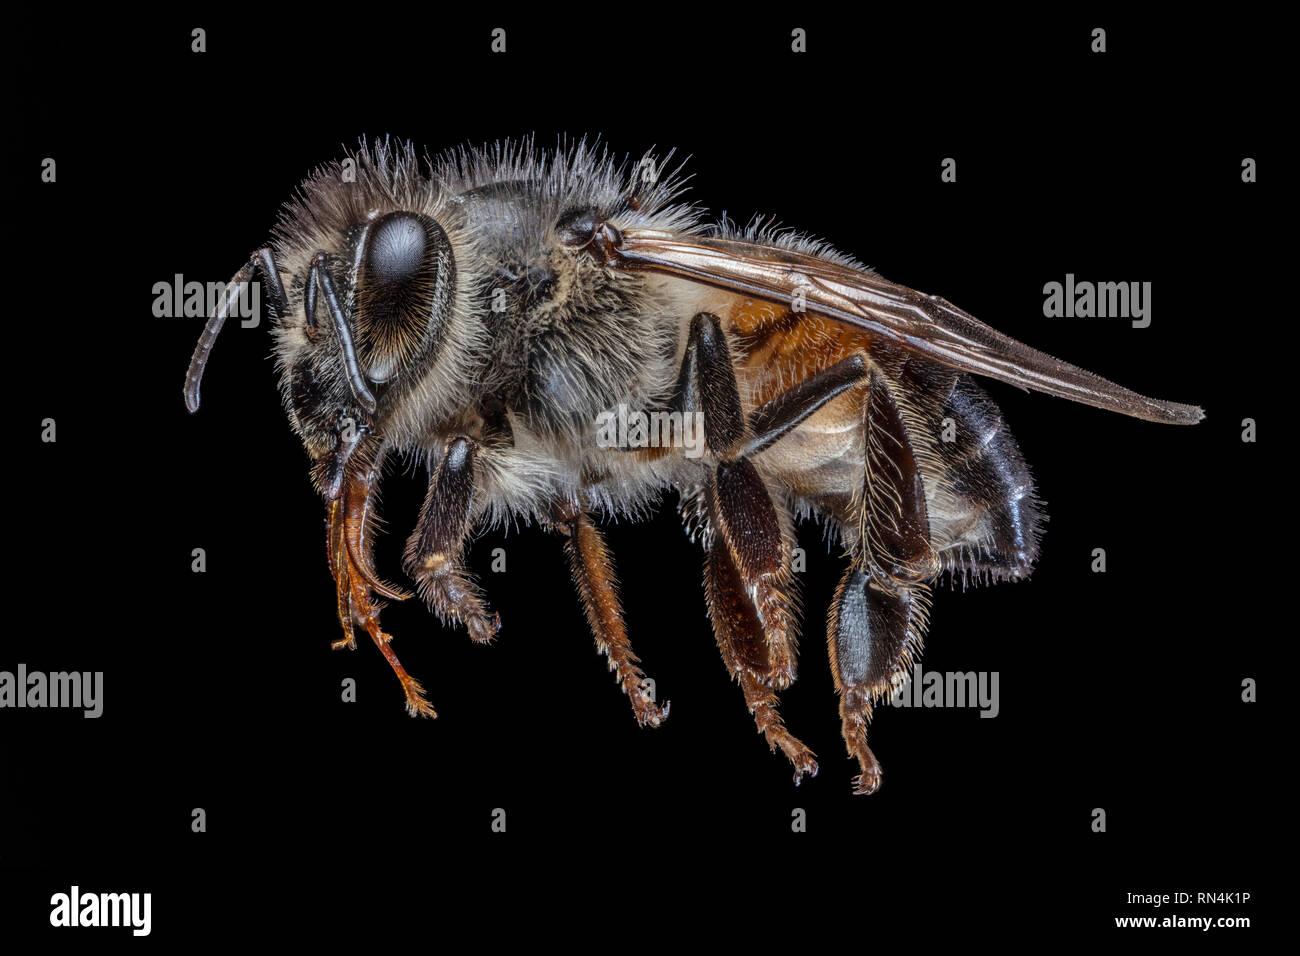 Honey Bee Close Up, Apis Sp. - Stock Image